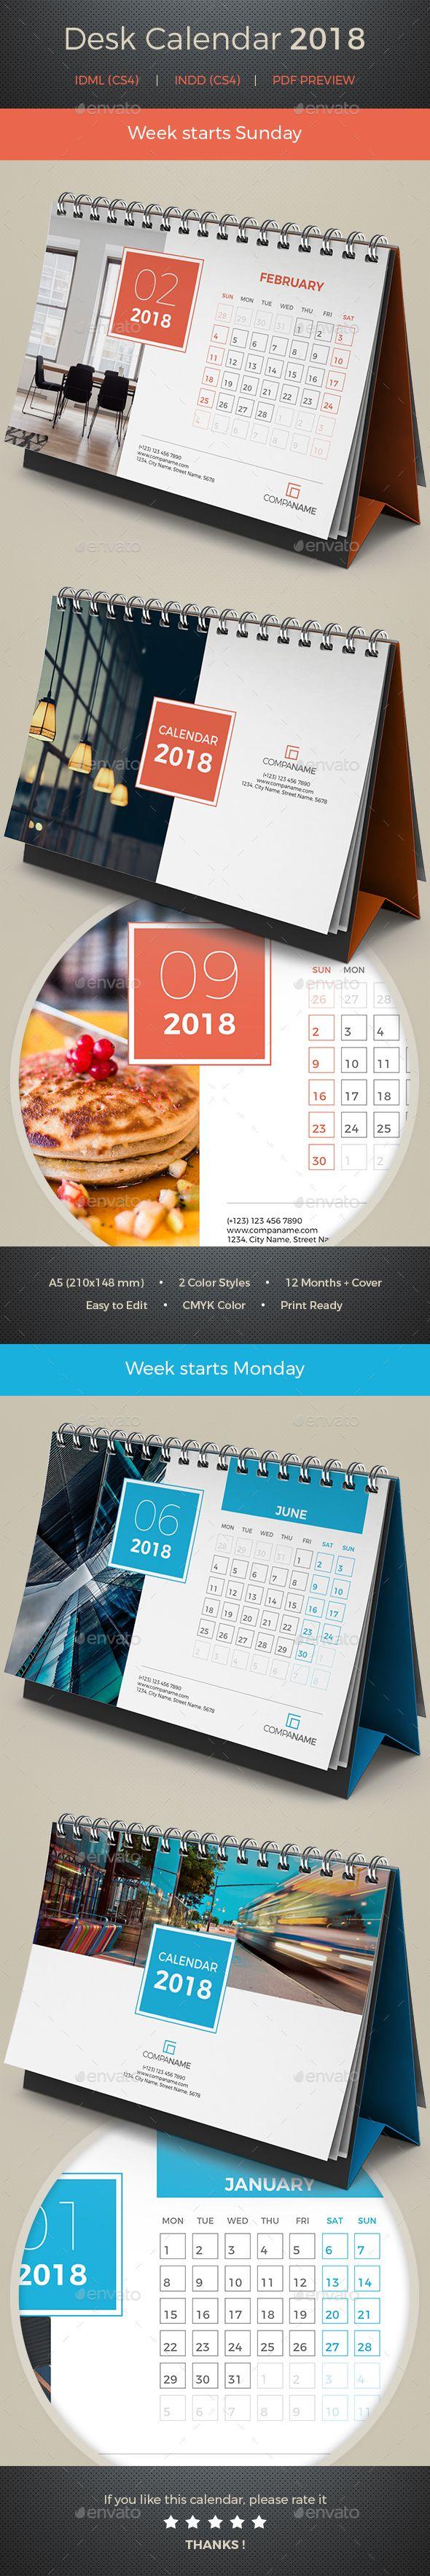 Desk Calendar 2018 - #Calendars #Stationery Download here: https://graphicriver.net/item/desk-calendar-2018/20308814?ref=alena994